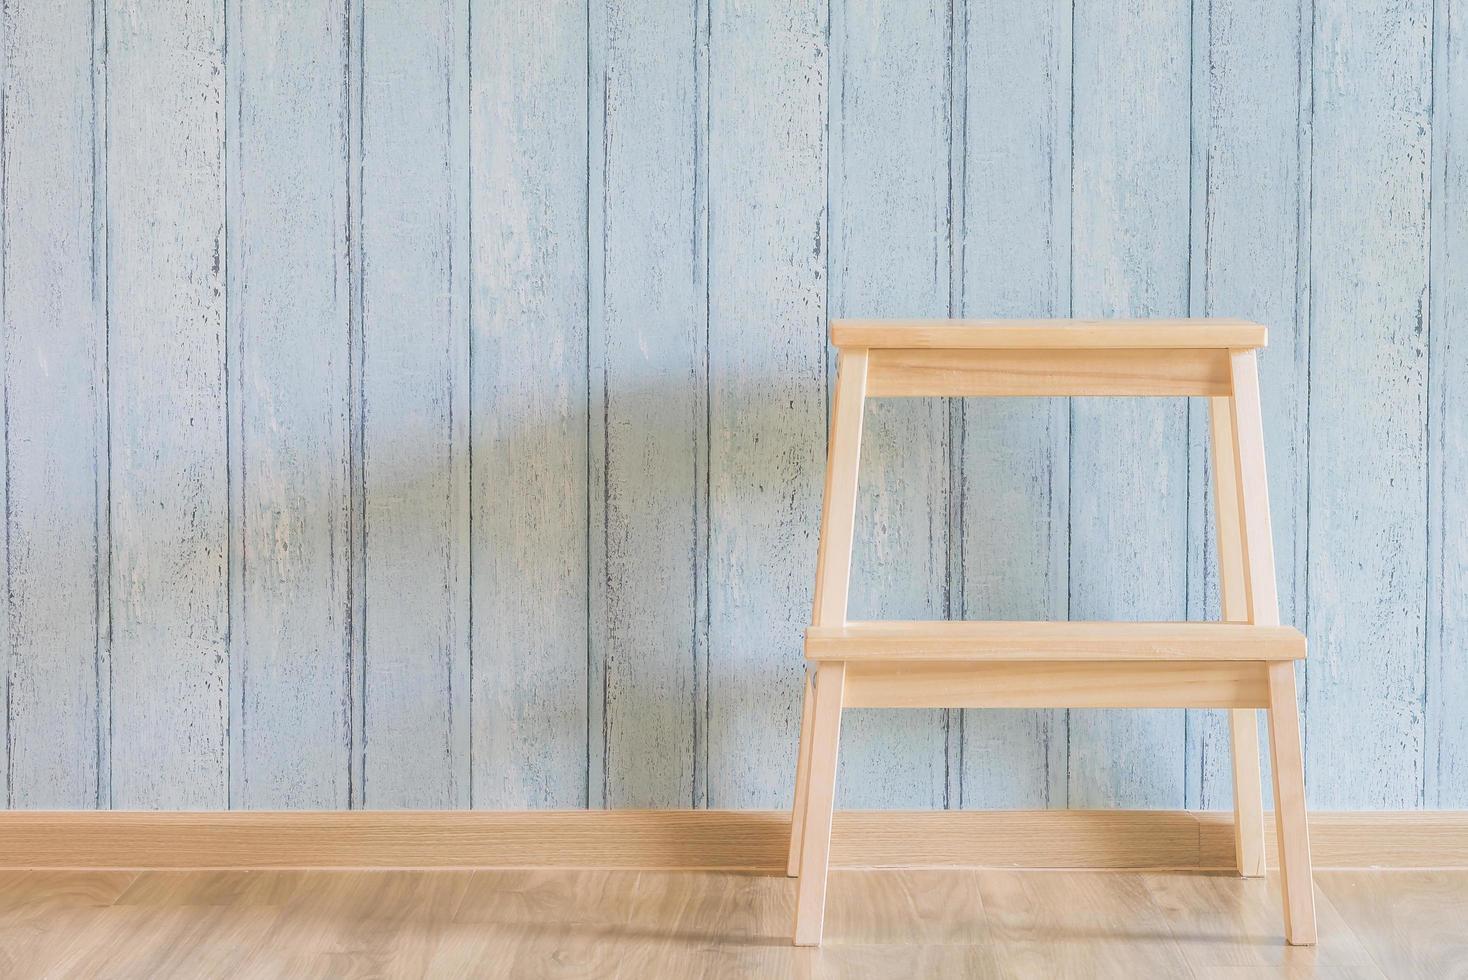 vintage houten stoel op hout achtergrond foto